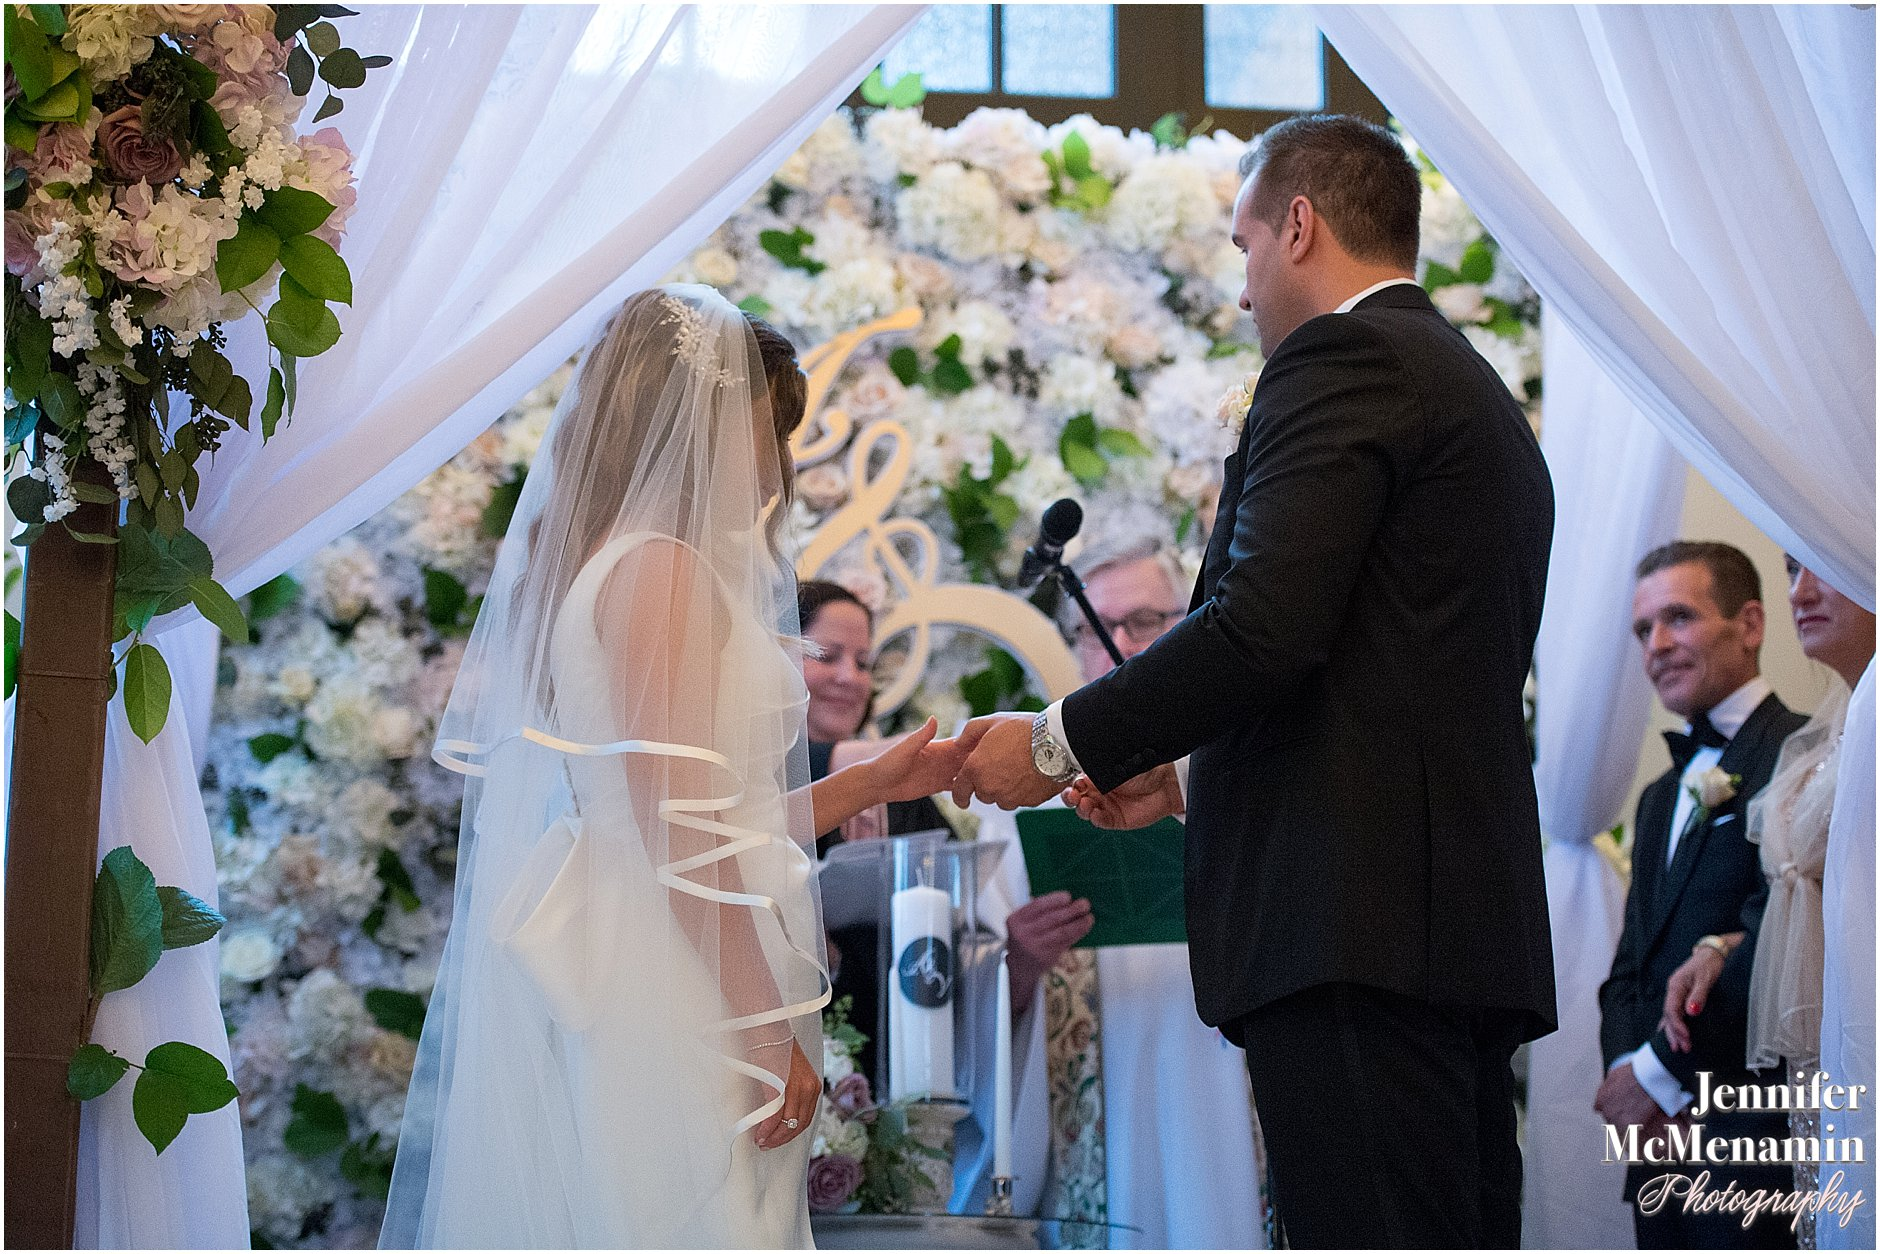 Jennifer-McMenamin-Photography-Sagamore-Pendry-wedding_1093.jpg